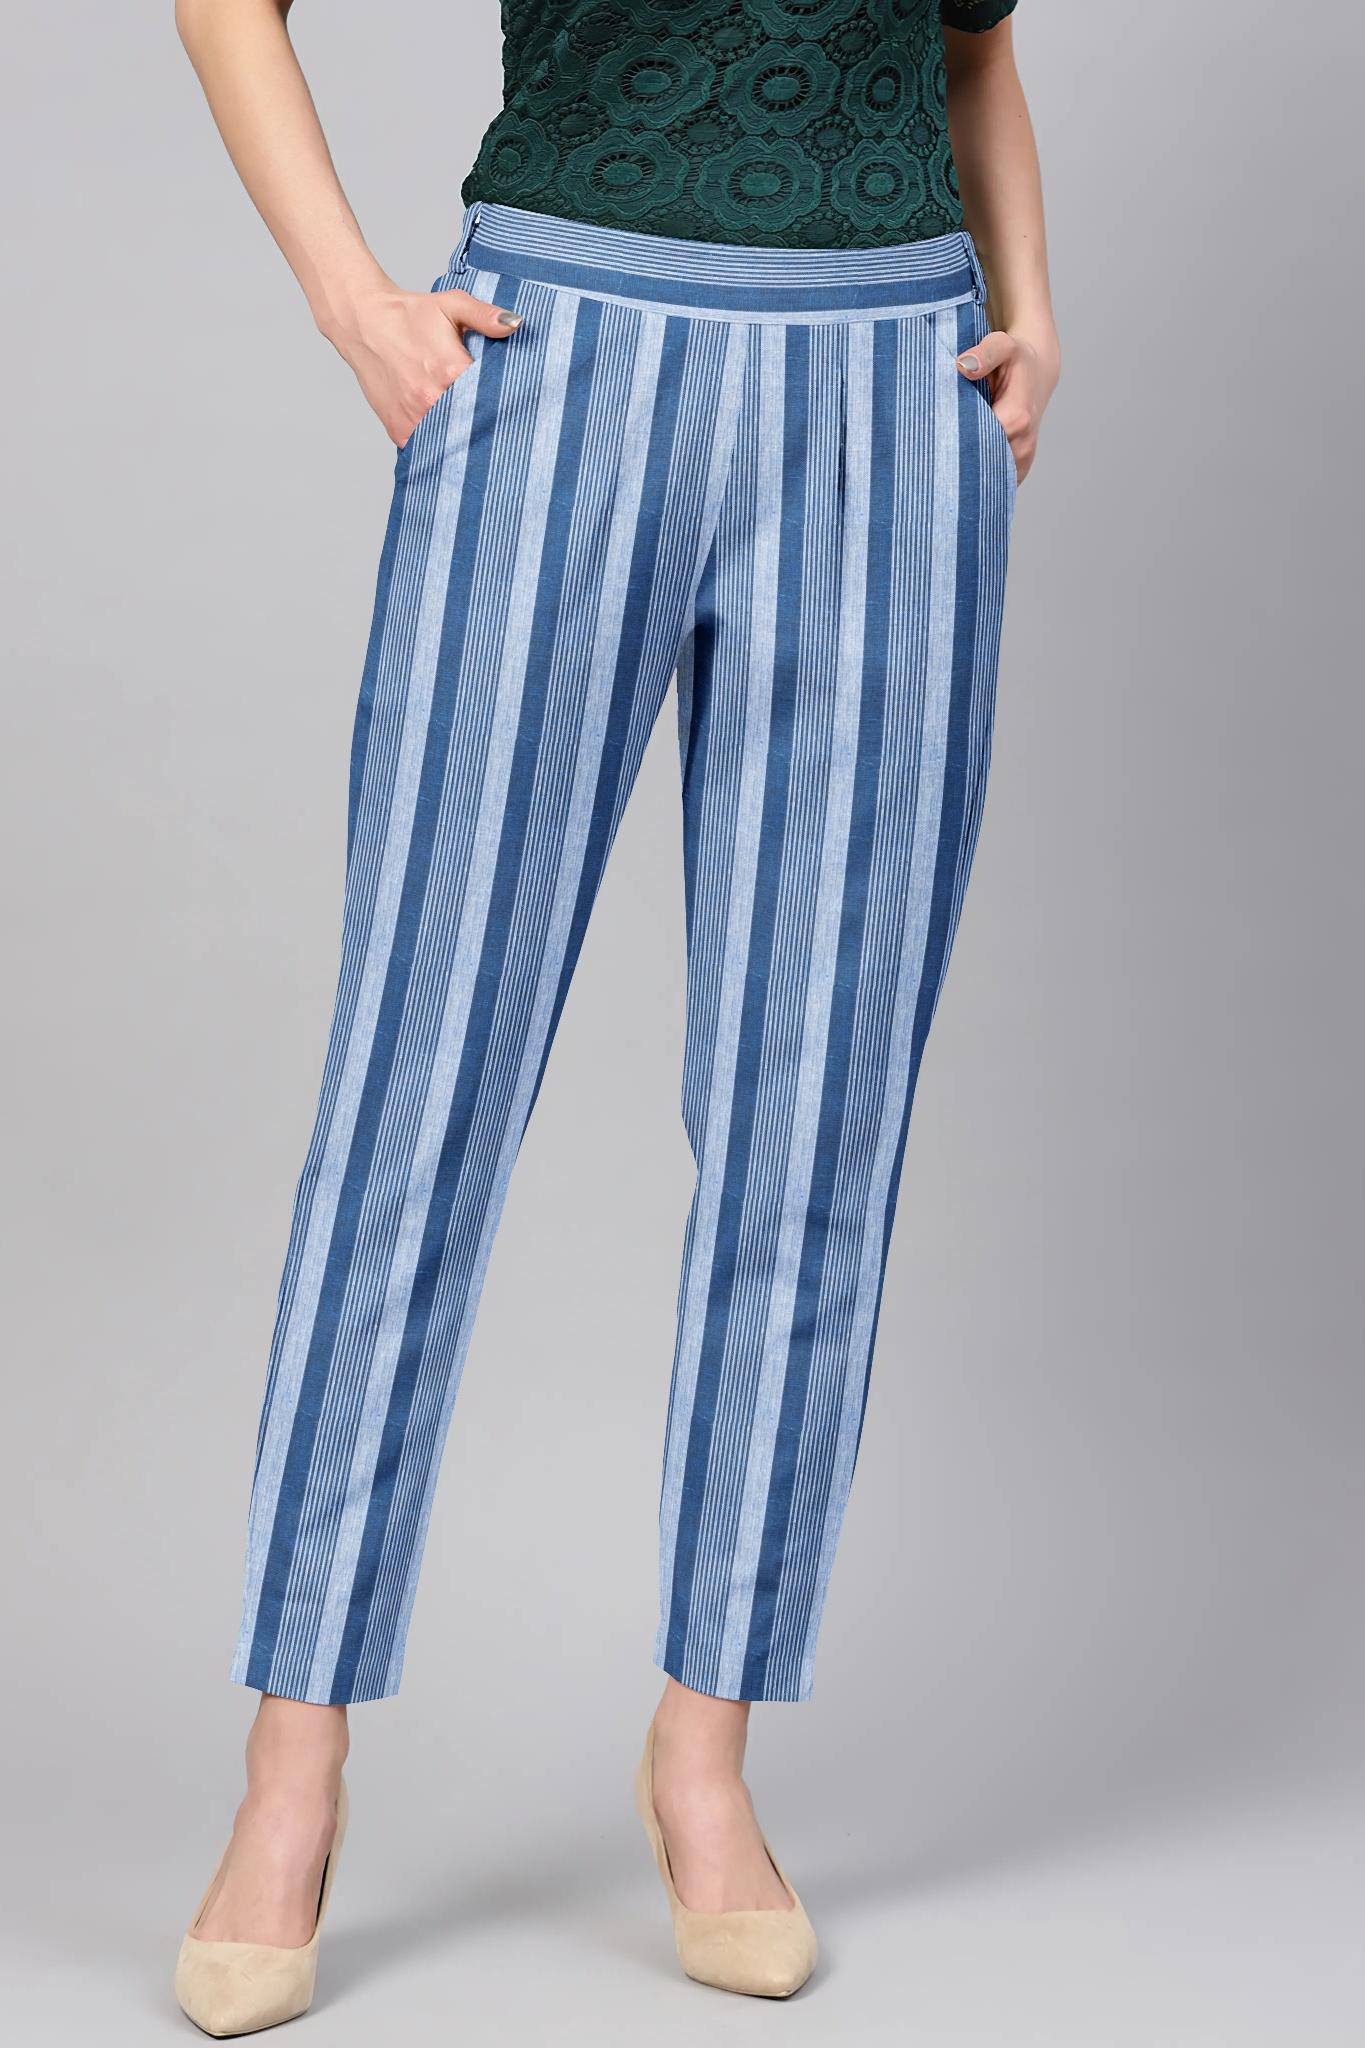 /home/customer/www/fabartcraft.com/public_html/uploadshttps://www.shopolics.com/uploads/images/medium/White-Blue-Cotton-Stripe-Regular-Fit-Solid-Trouser-36090.jpg